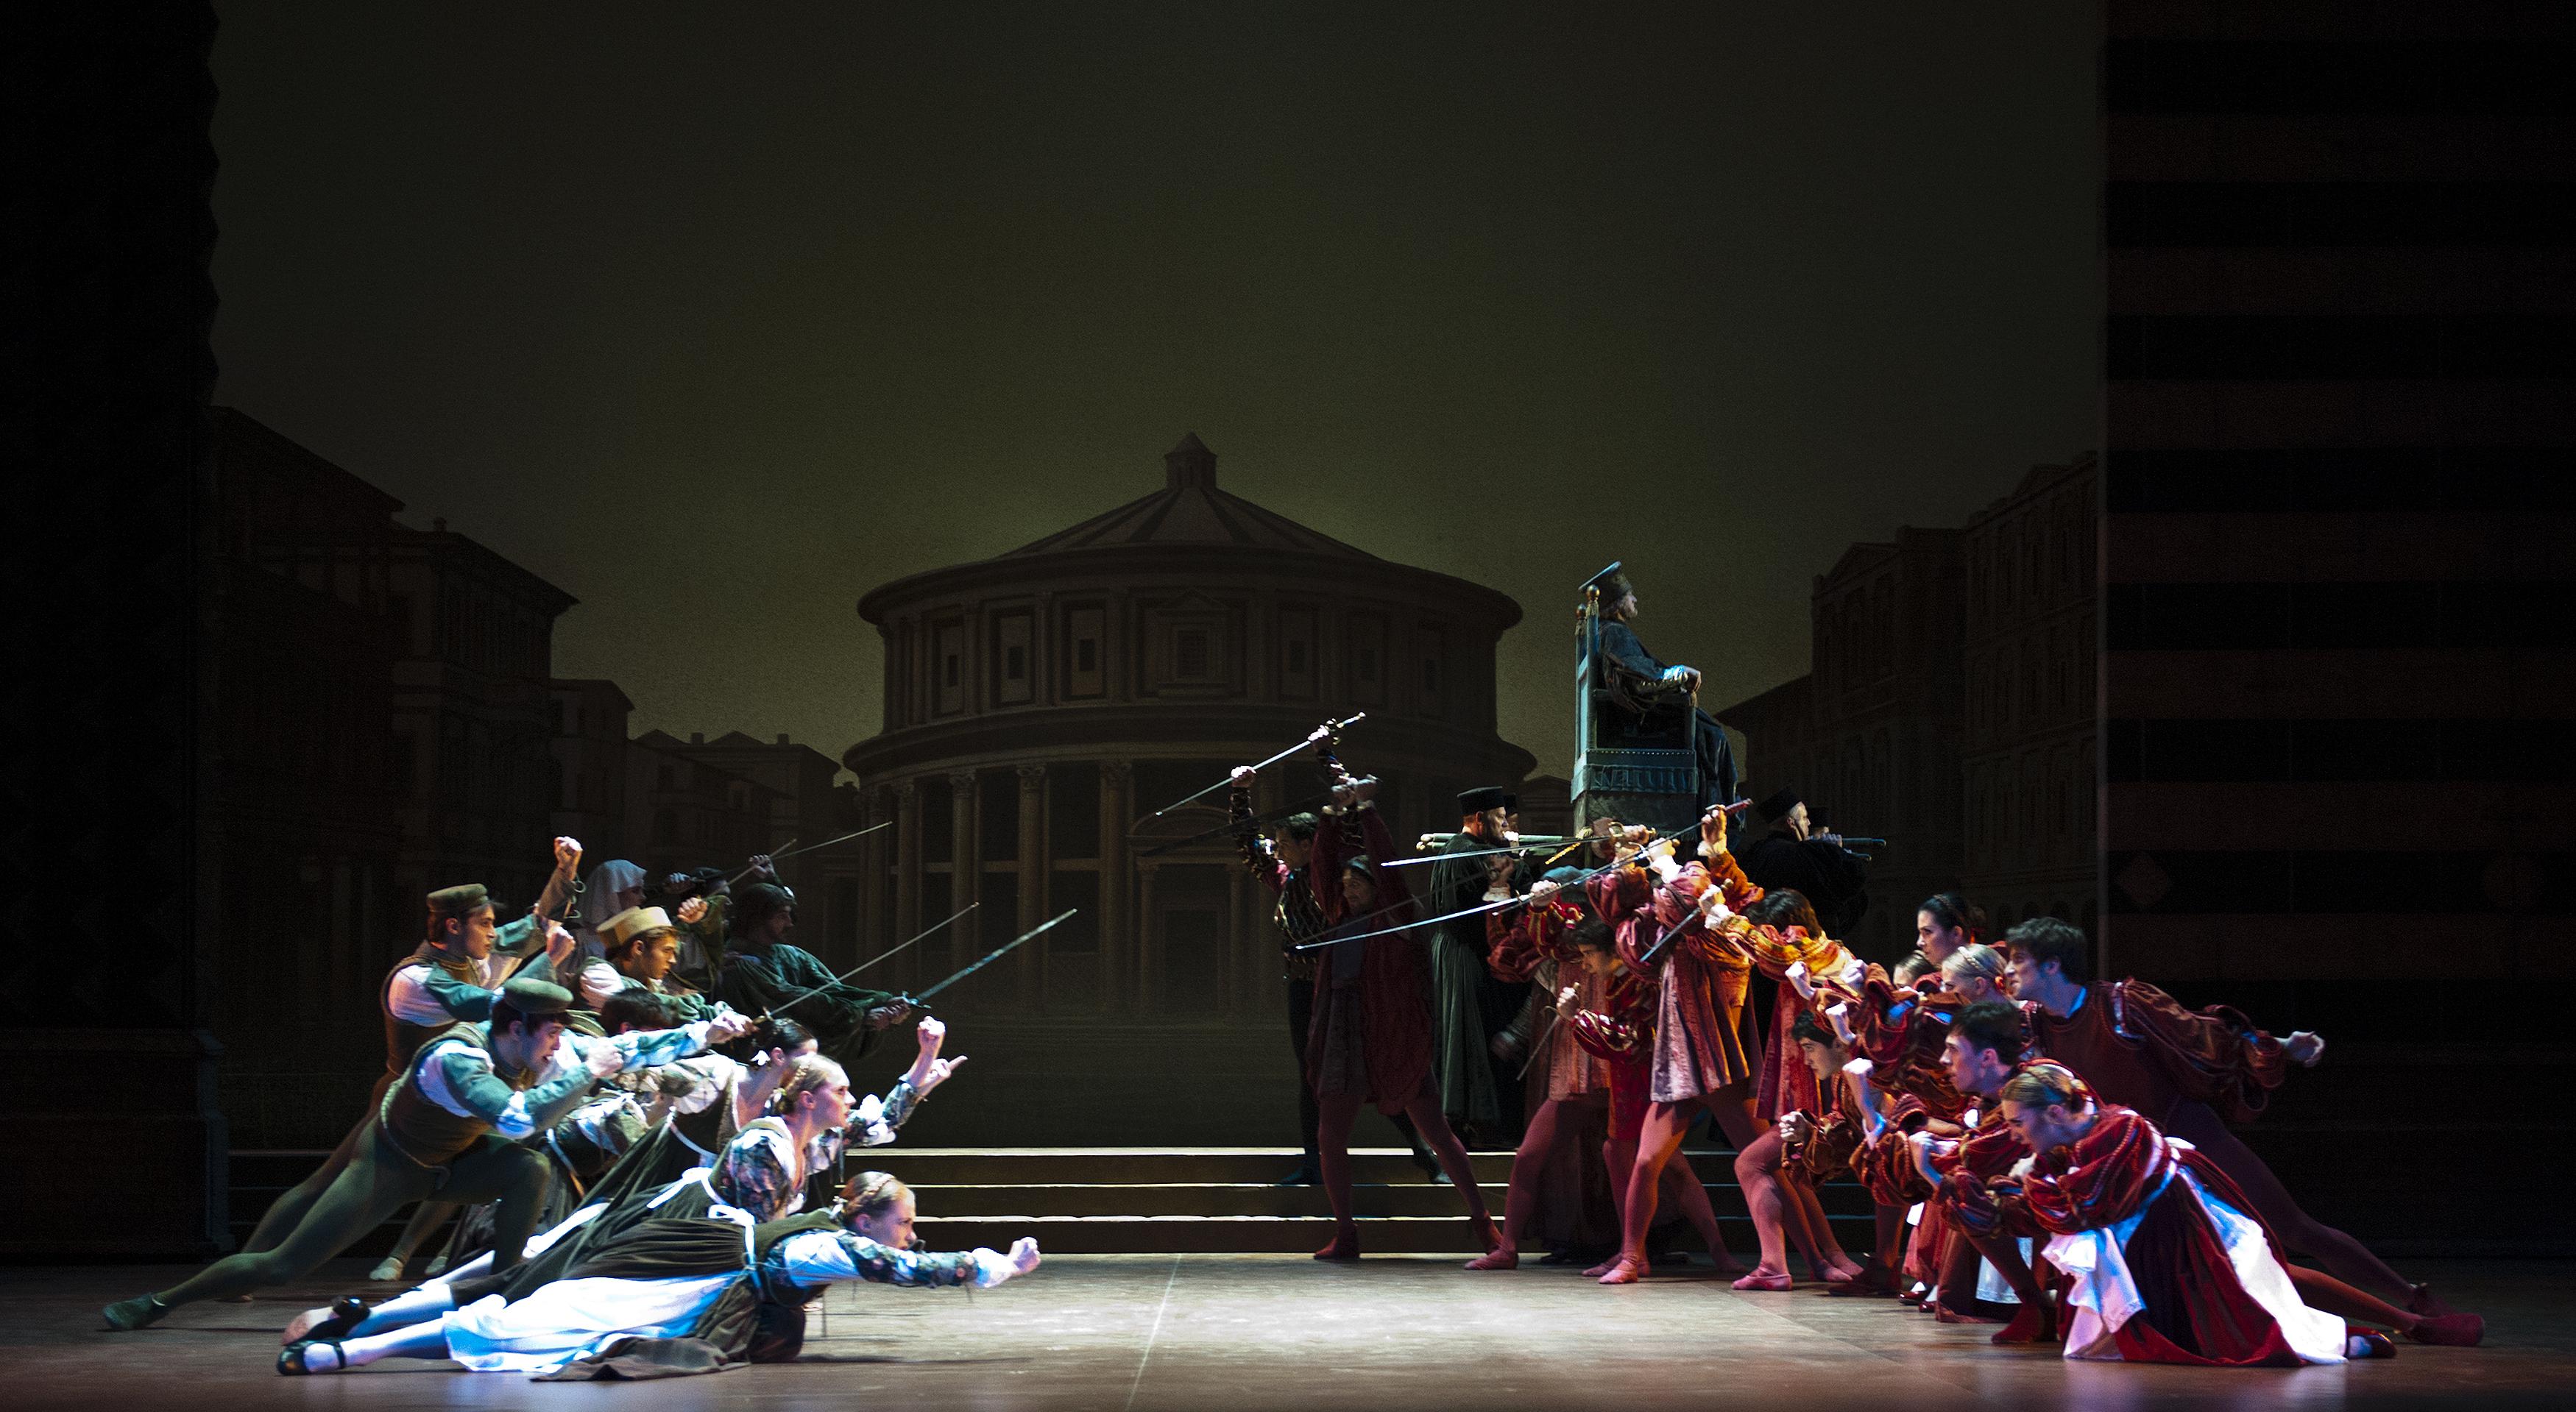 Romeo & Juliet. English National Ballet. Rudolf Nureyev production of Romeo & Juliet. Photo by Patrick Baldwin.